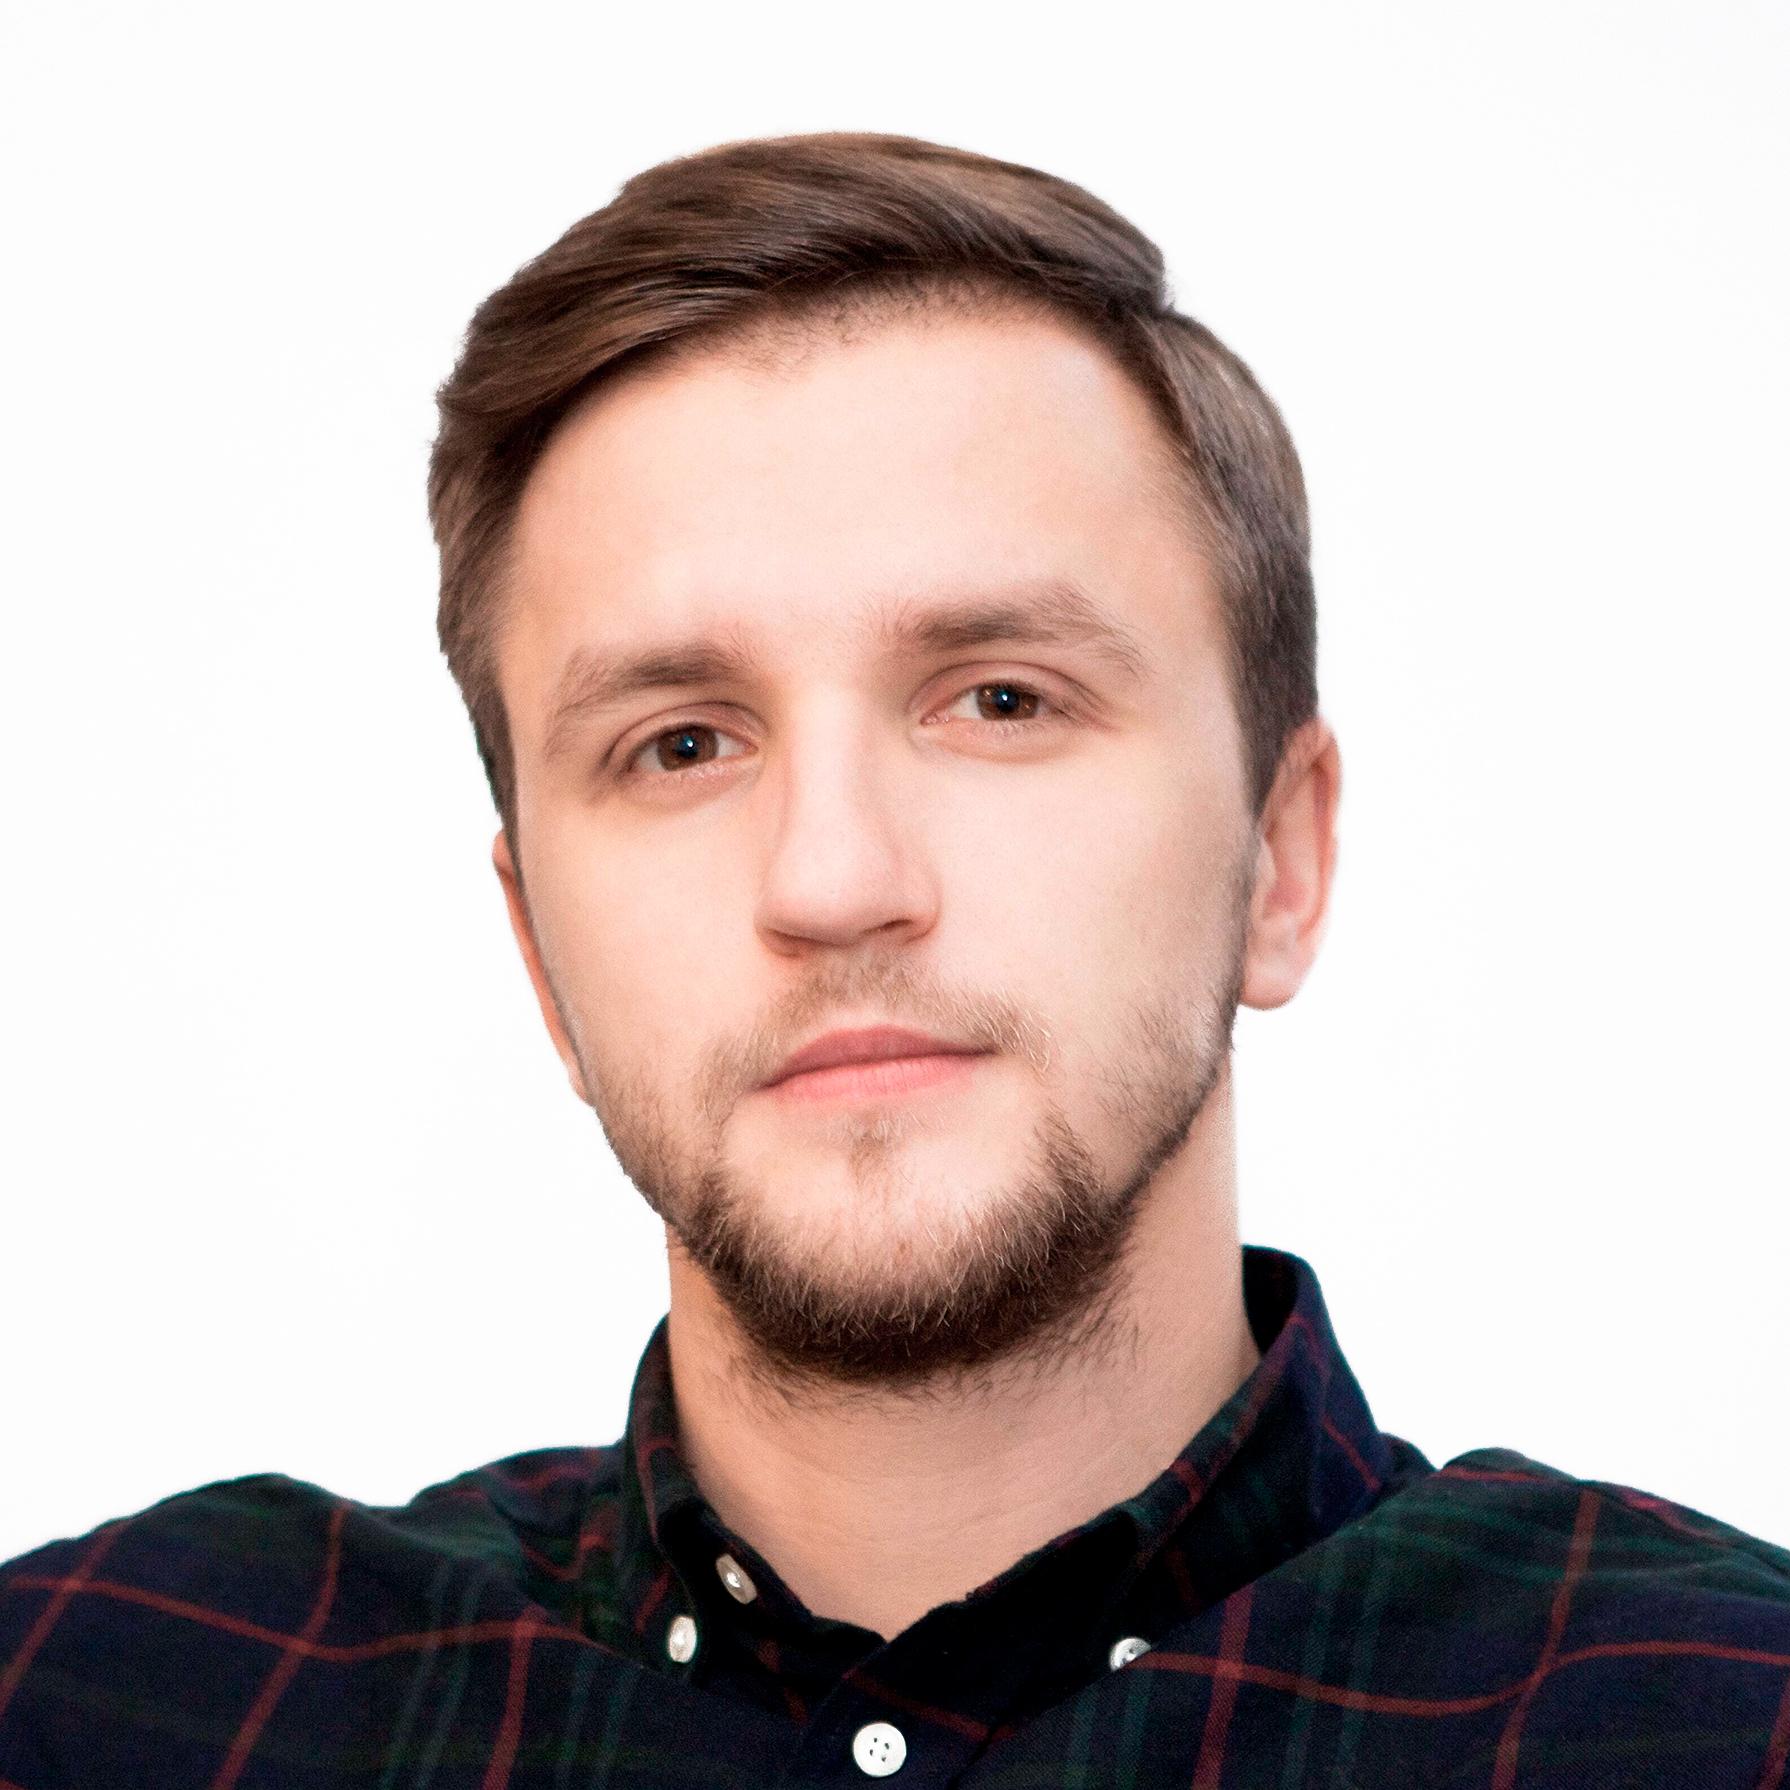 Ilya Shkirenko